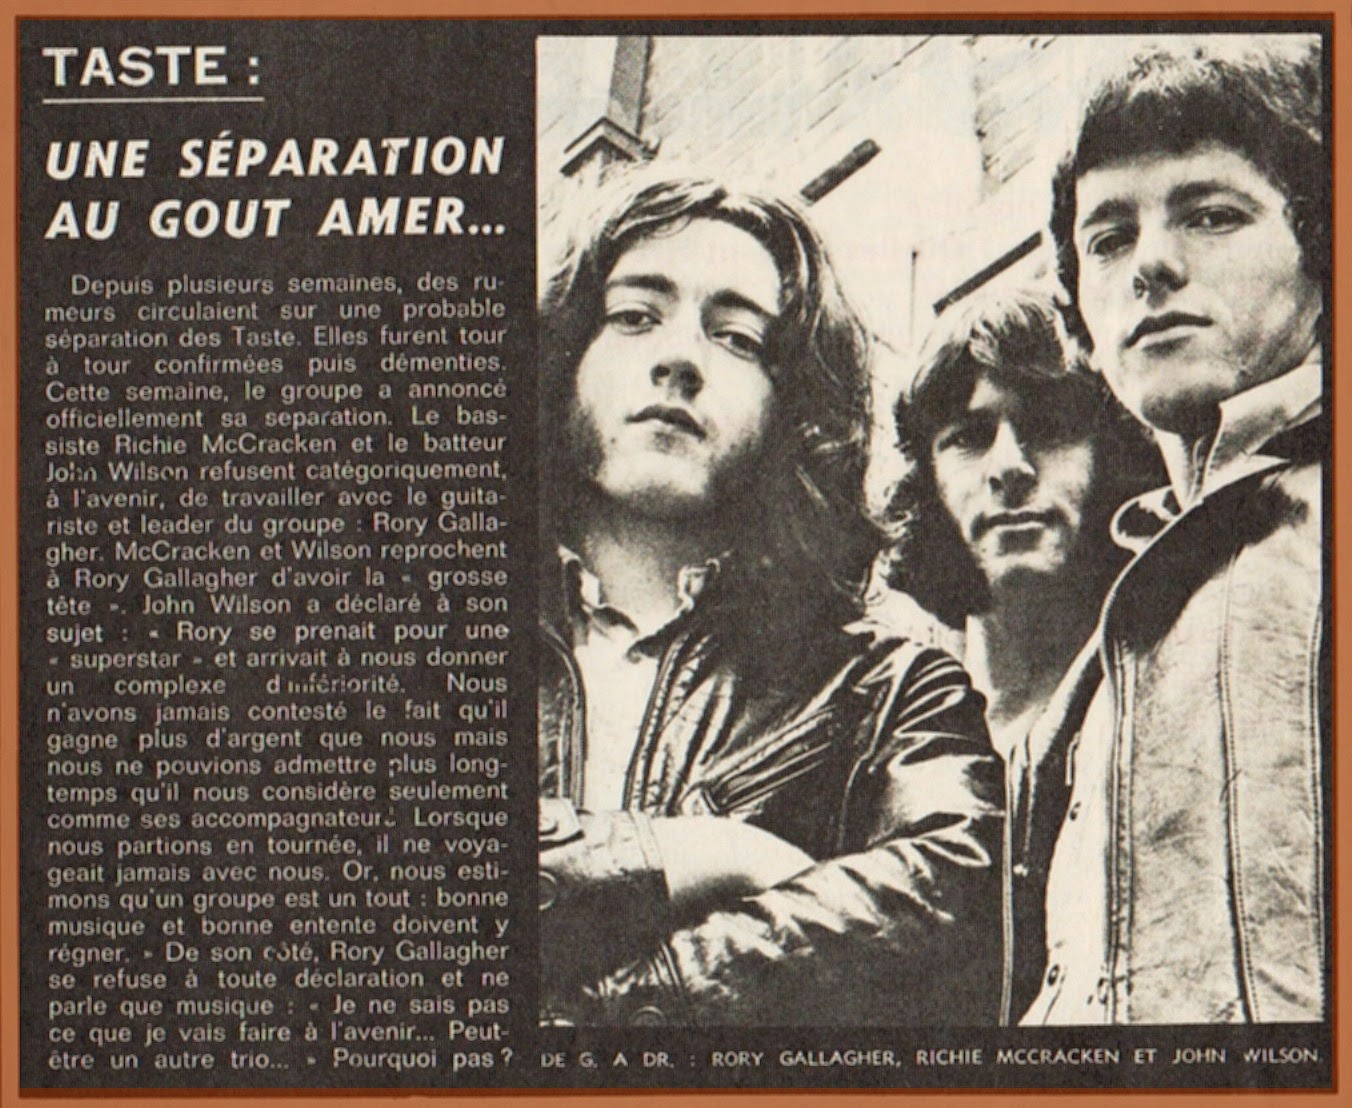 Taste Mk 2 (1968-1970) - Page 17 Rory+Gallagher+-+Taste+SB+99669